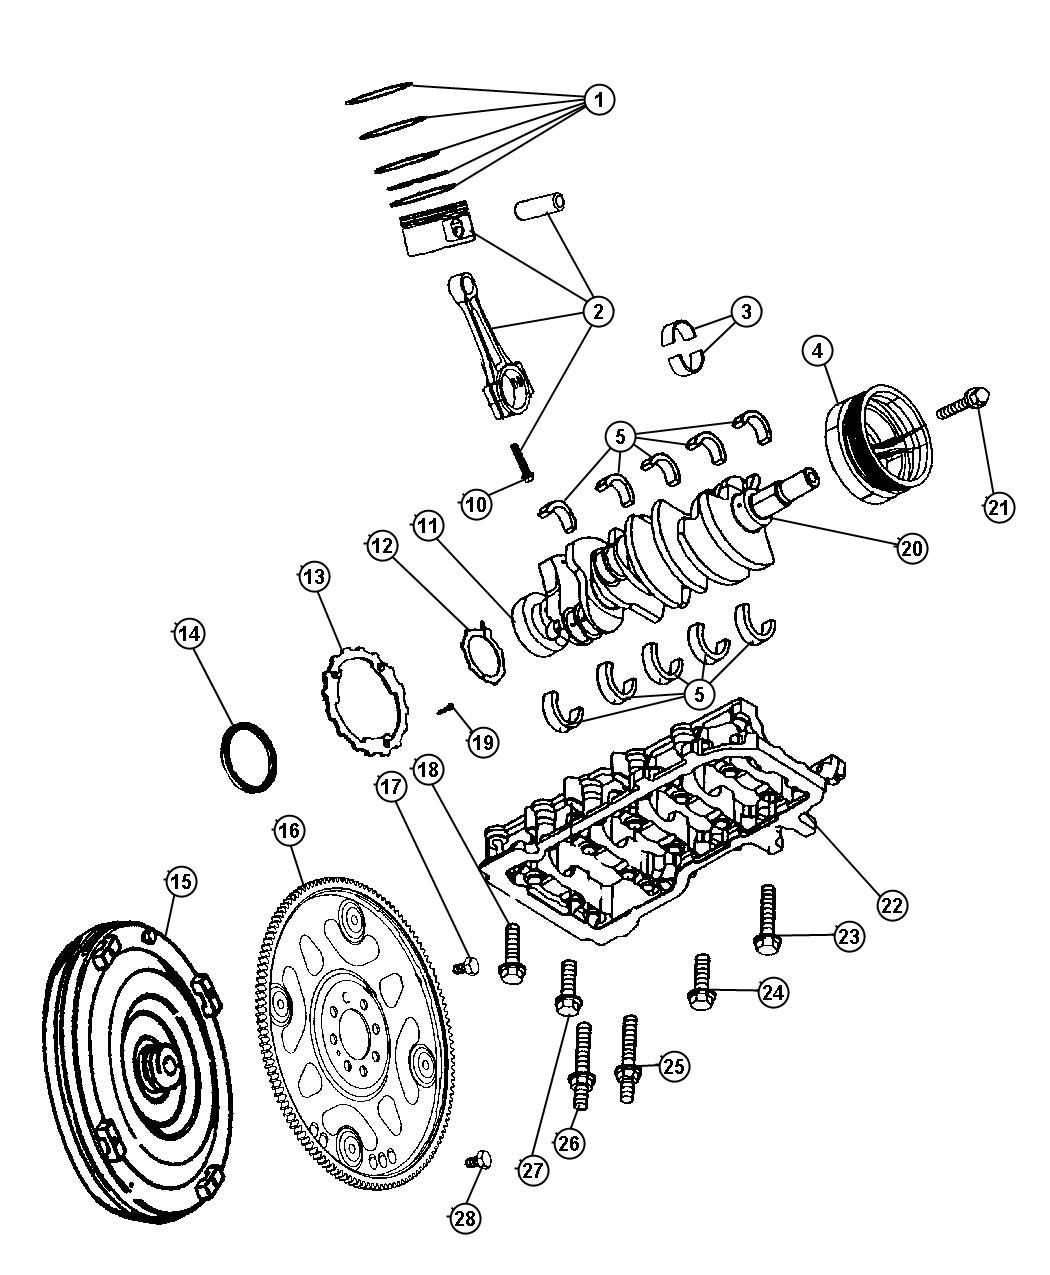 Formula 1 KERS System